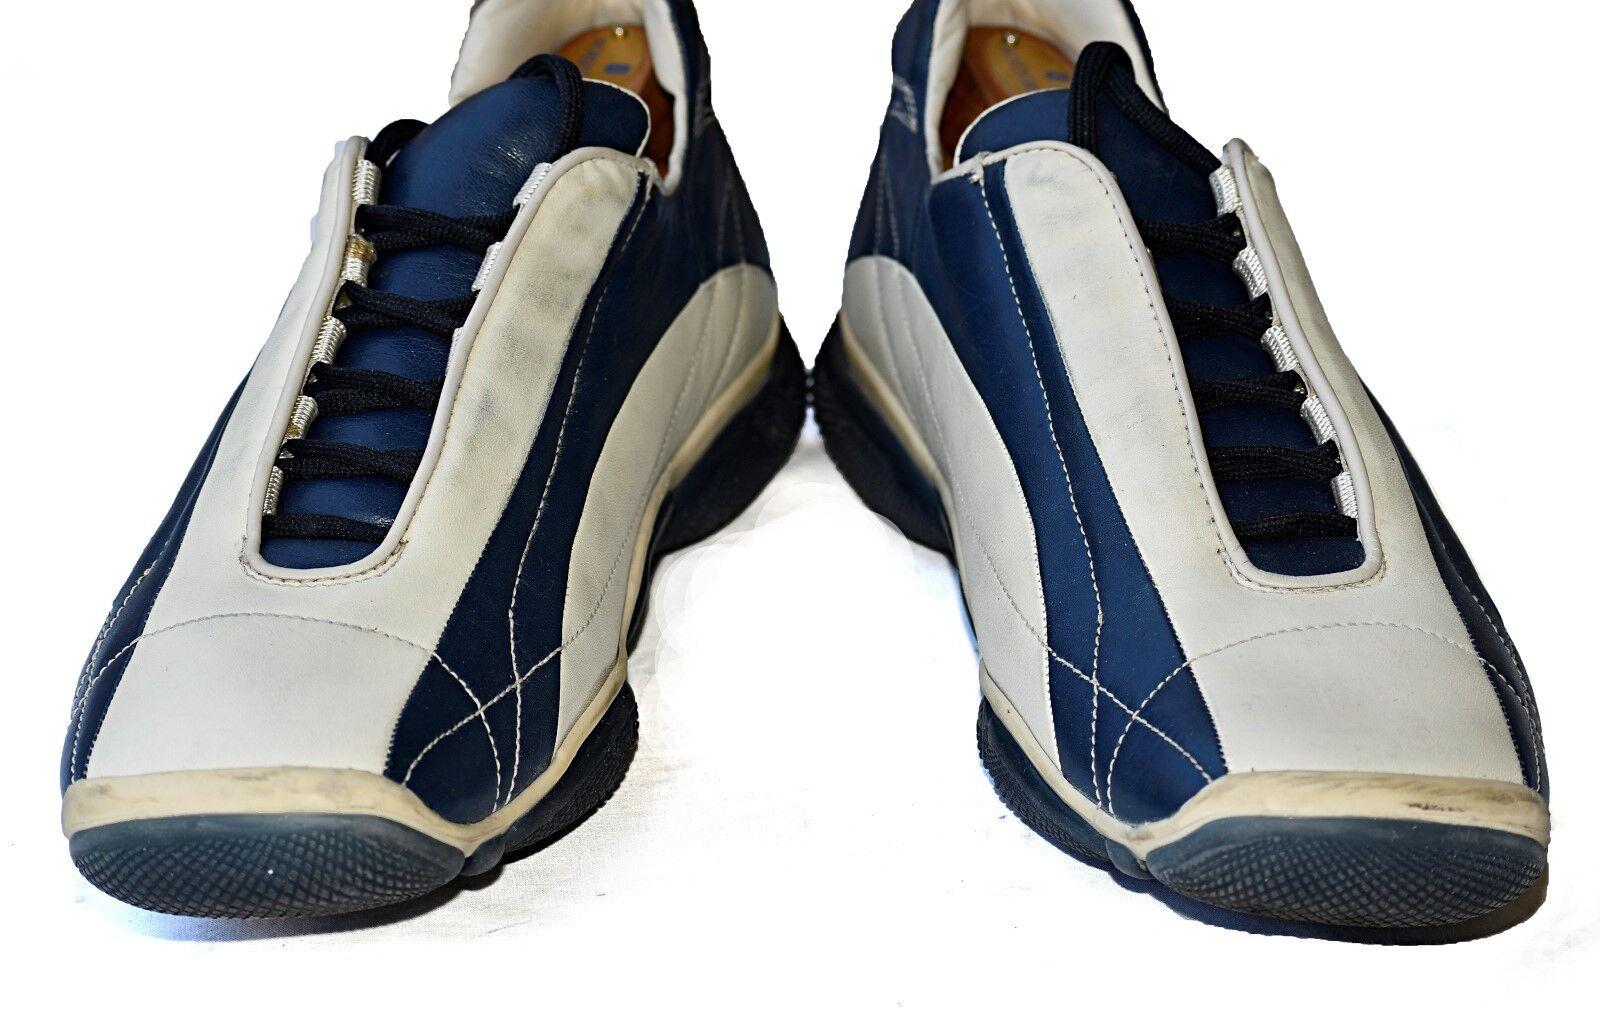 PRADA Fashion Sneakers blueE & CREAM 10.5E 10.5 E US size = 9.5E 9.5 Prada size